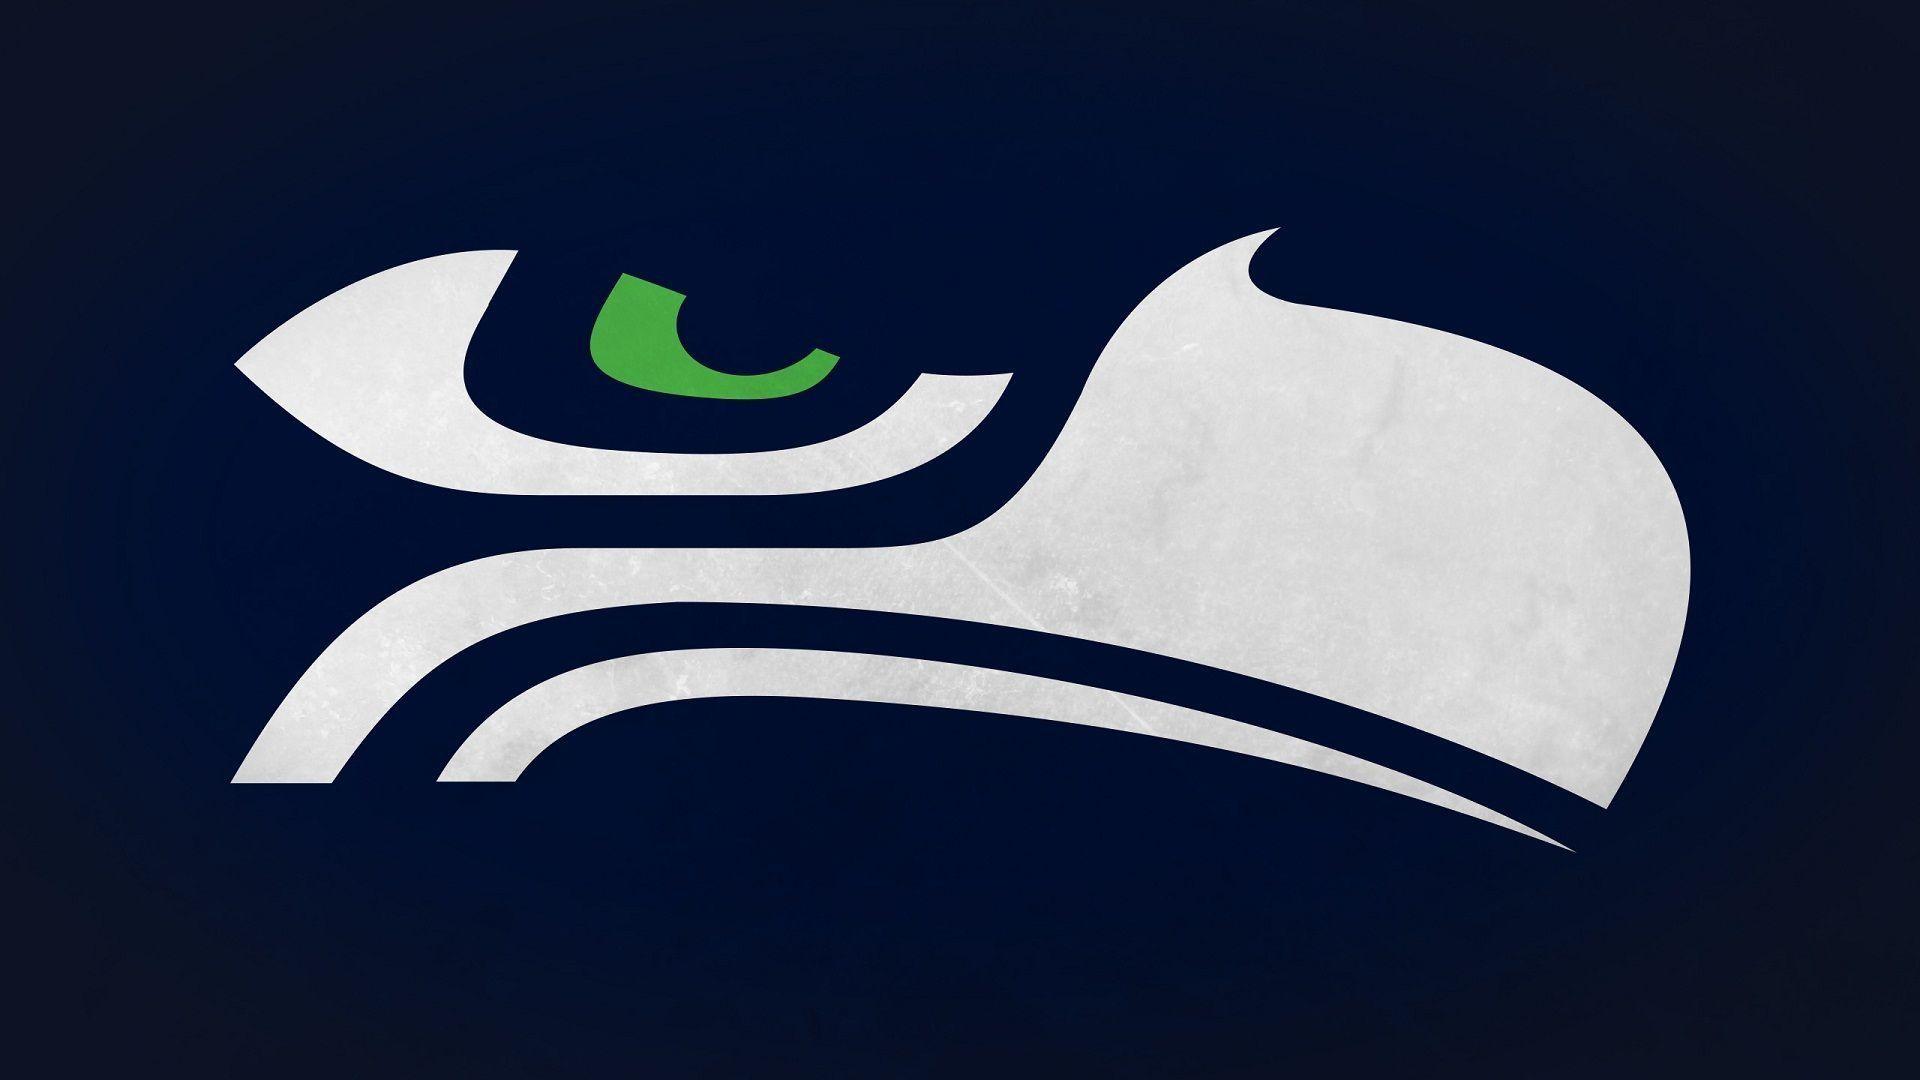 Logos For > Seahawks Logo Wallpaper For Ipad